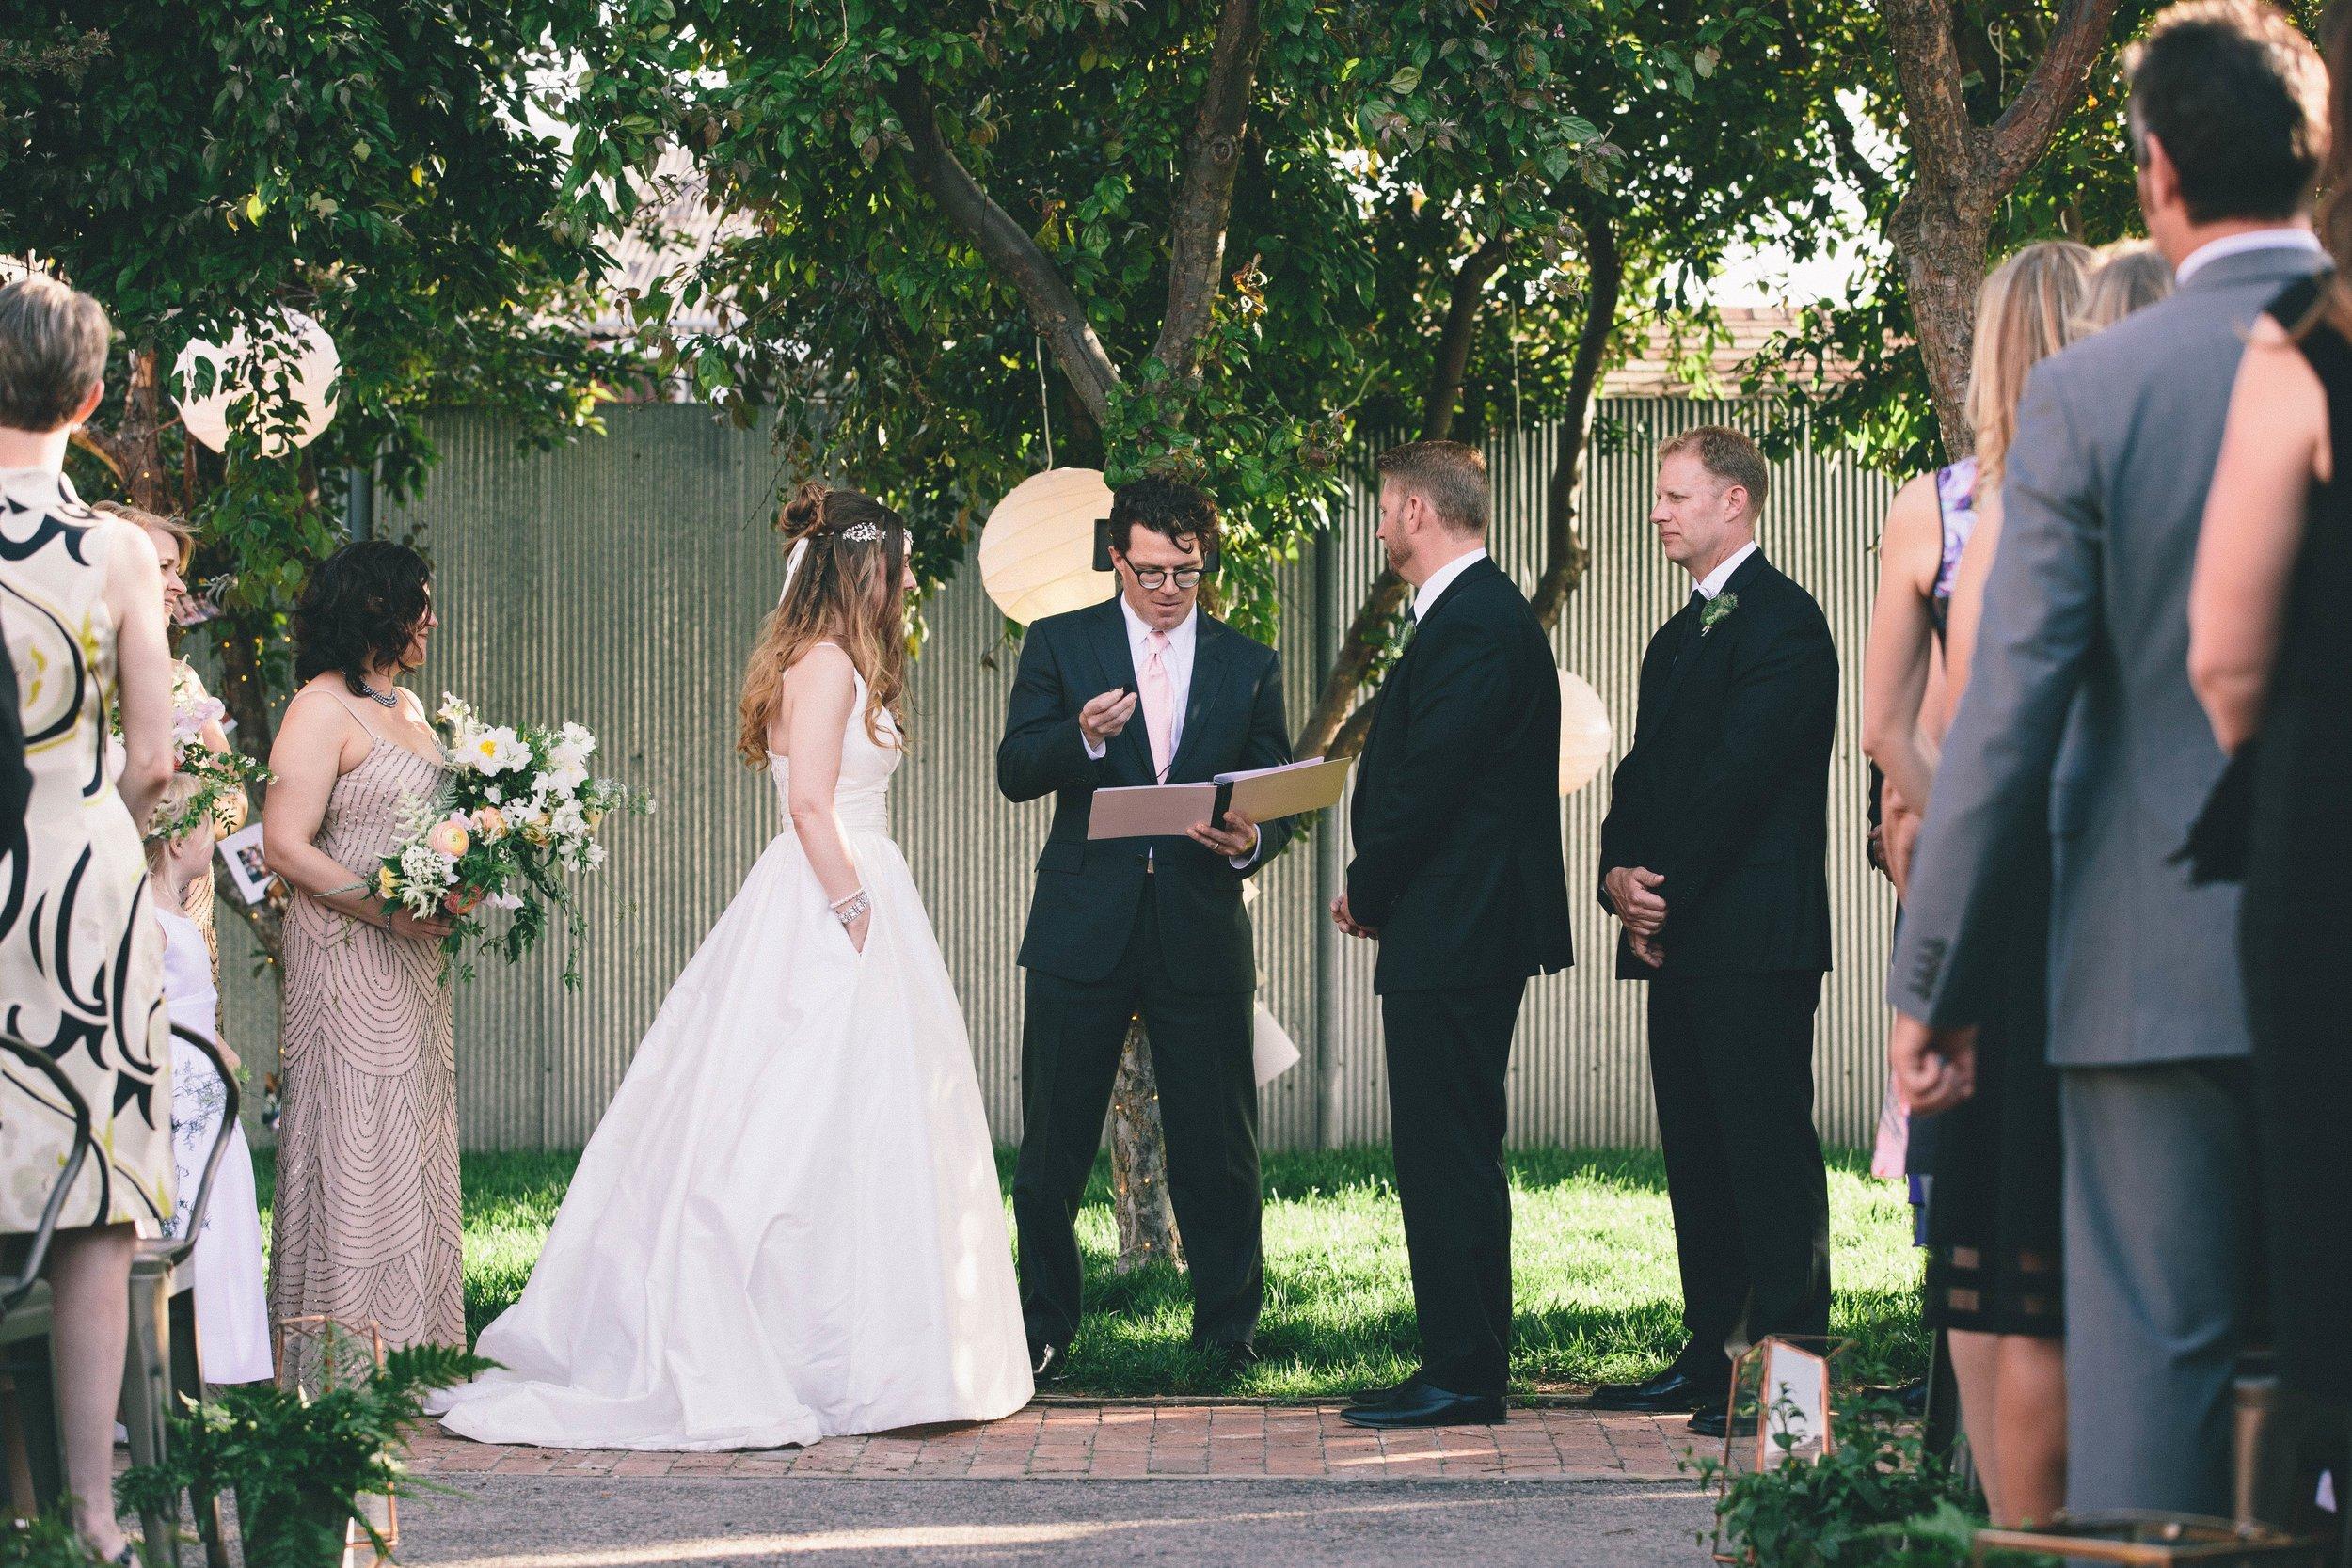 MP_16.05.21_Tina-&-Brad-Wedding-no-grain-0184.jpg